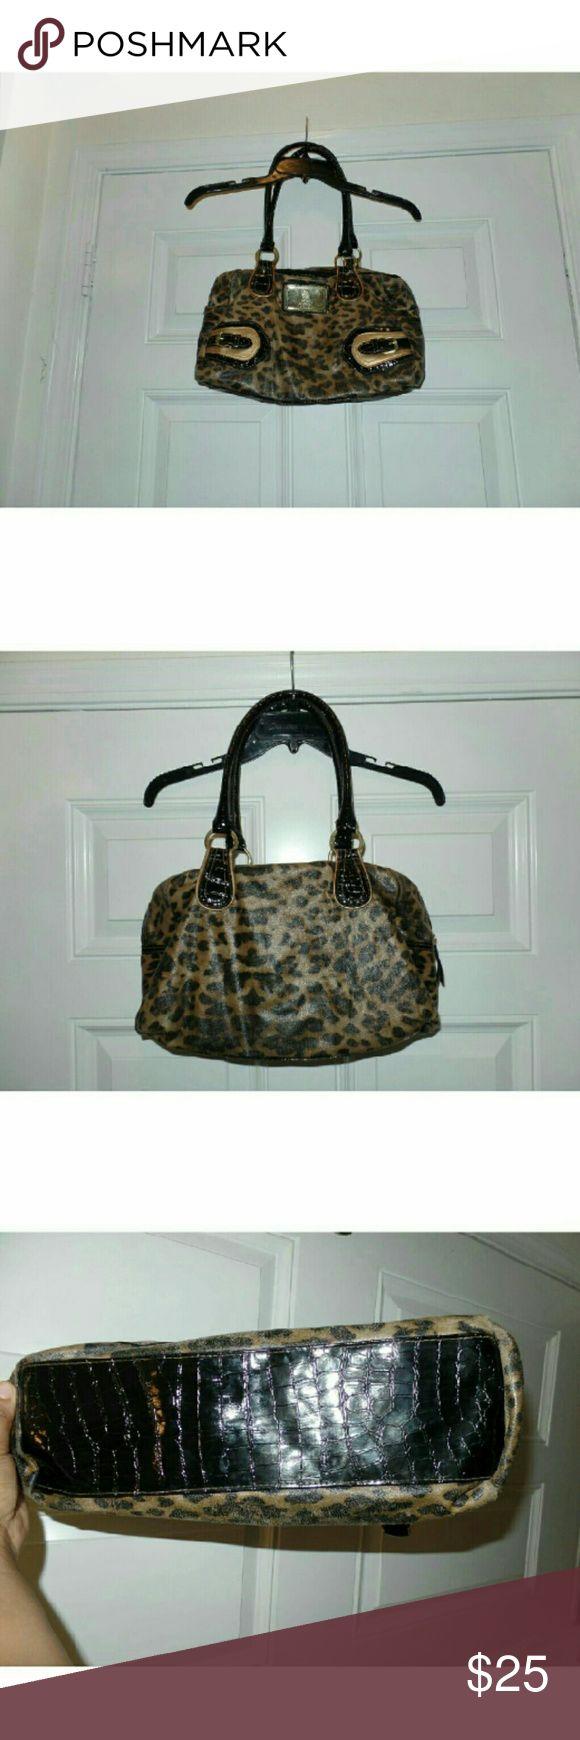 Leopard U.S. Polo Assn. Purse Beautiful Leaopar U.S. Polo Assn. handbag. In excellent condition! U.S. Polo Assn Bags Shoulder Bags